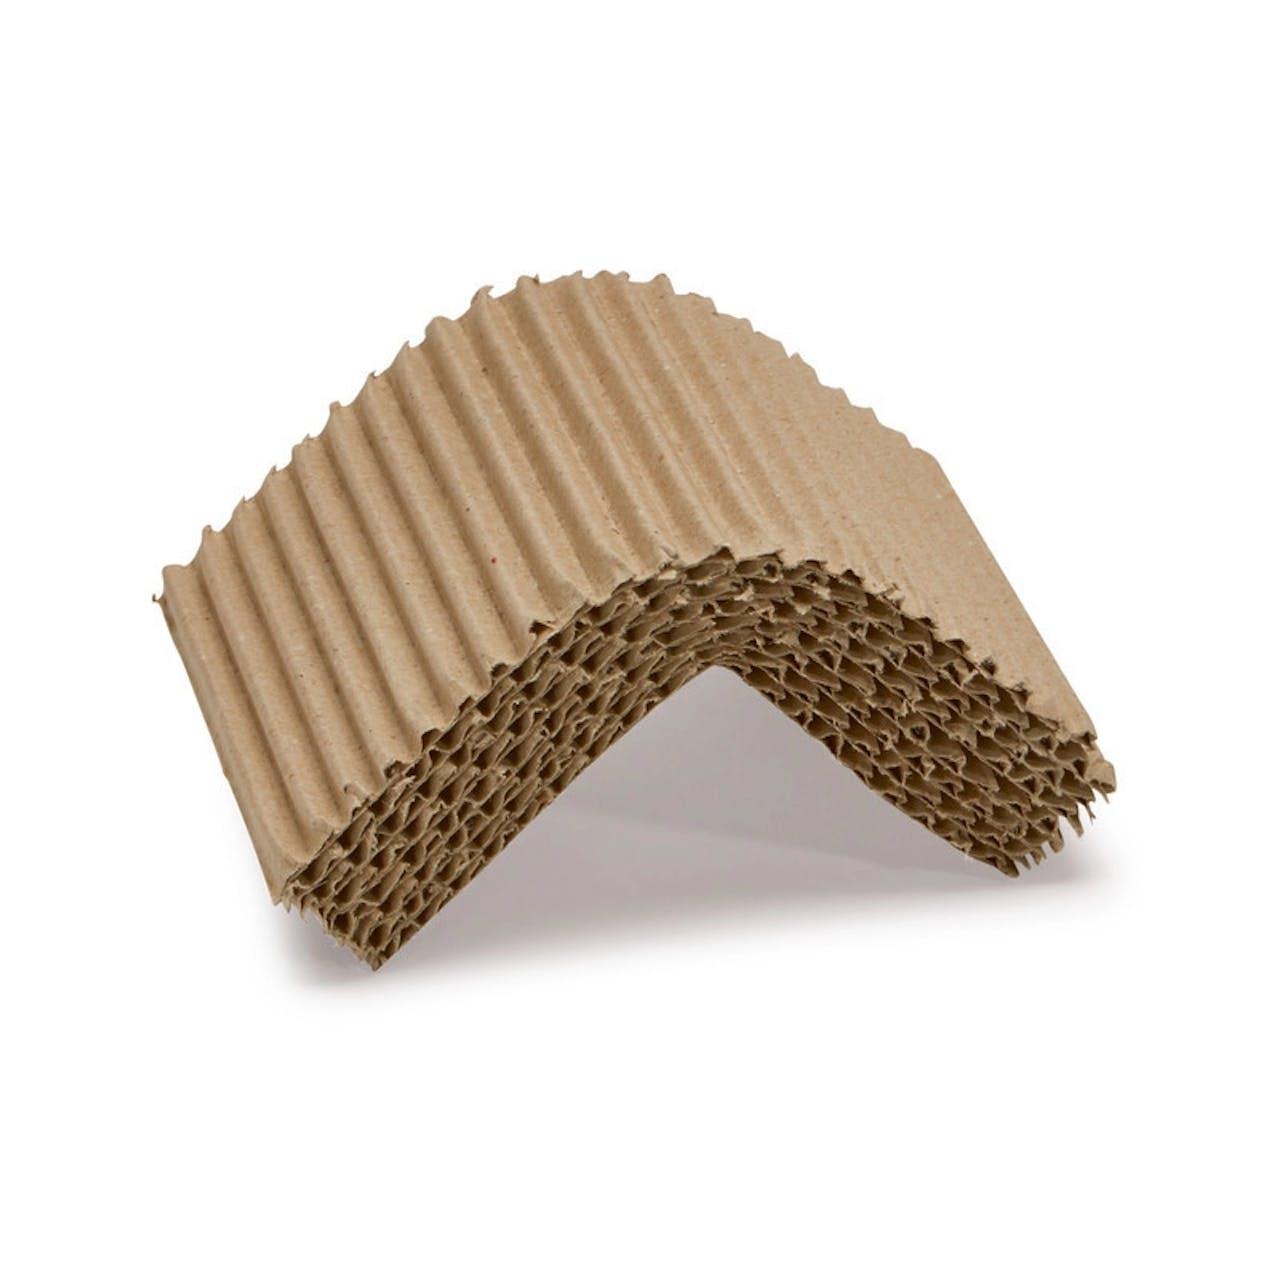 Calage carton ondulé terra, Profilé en L